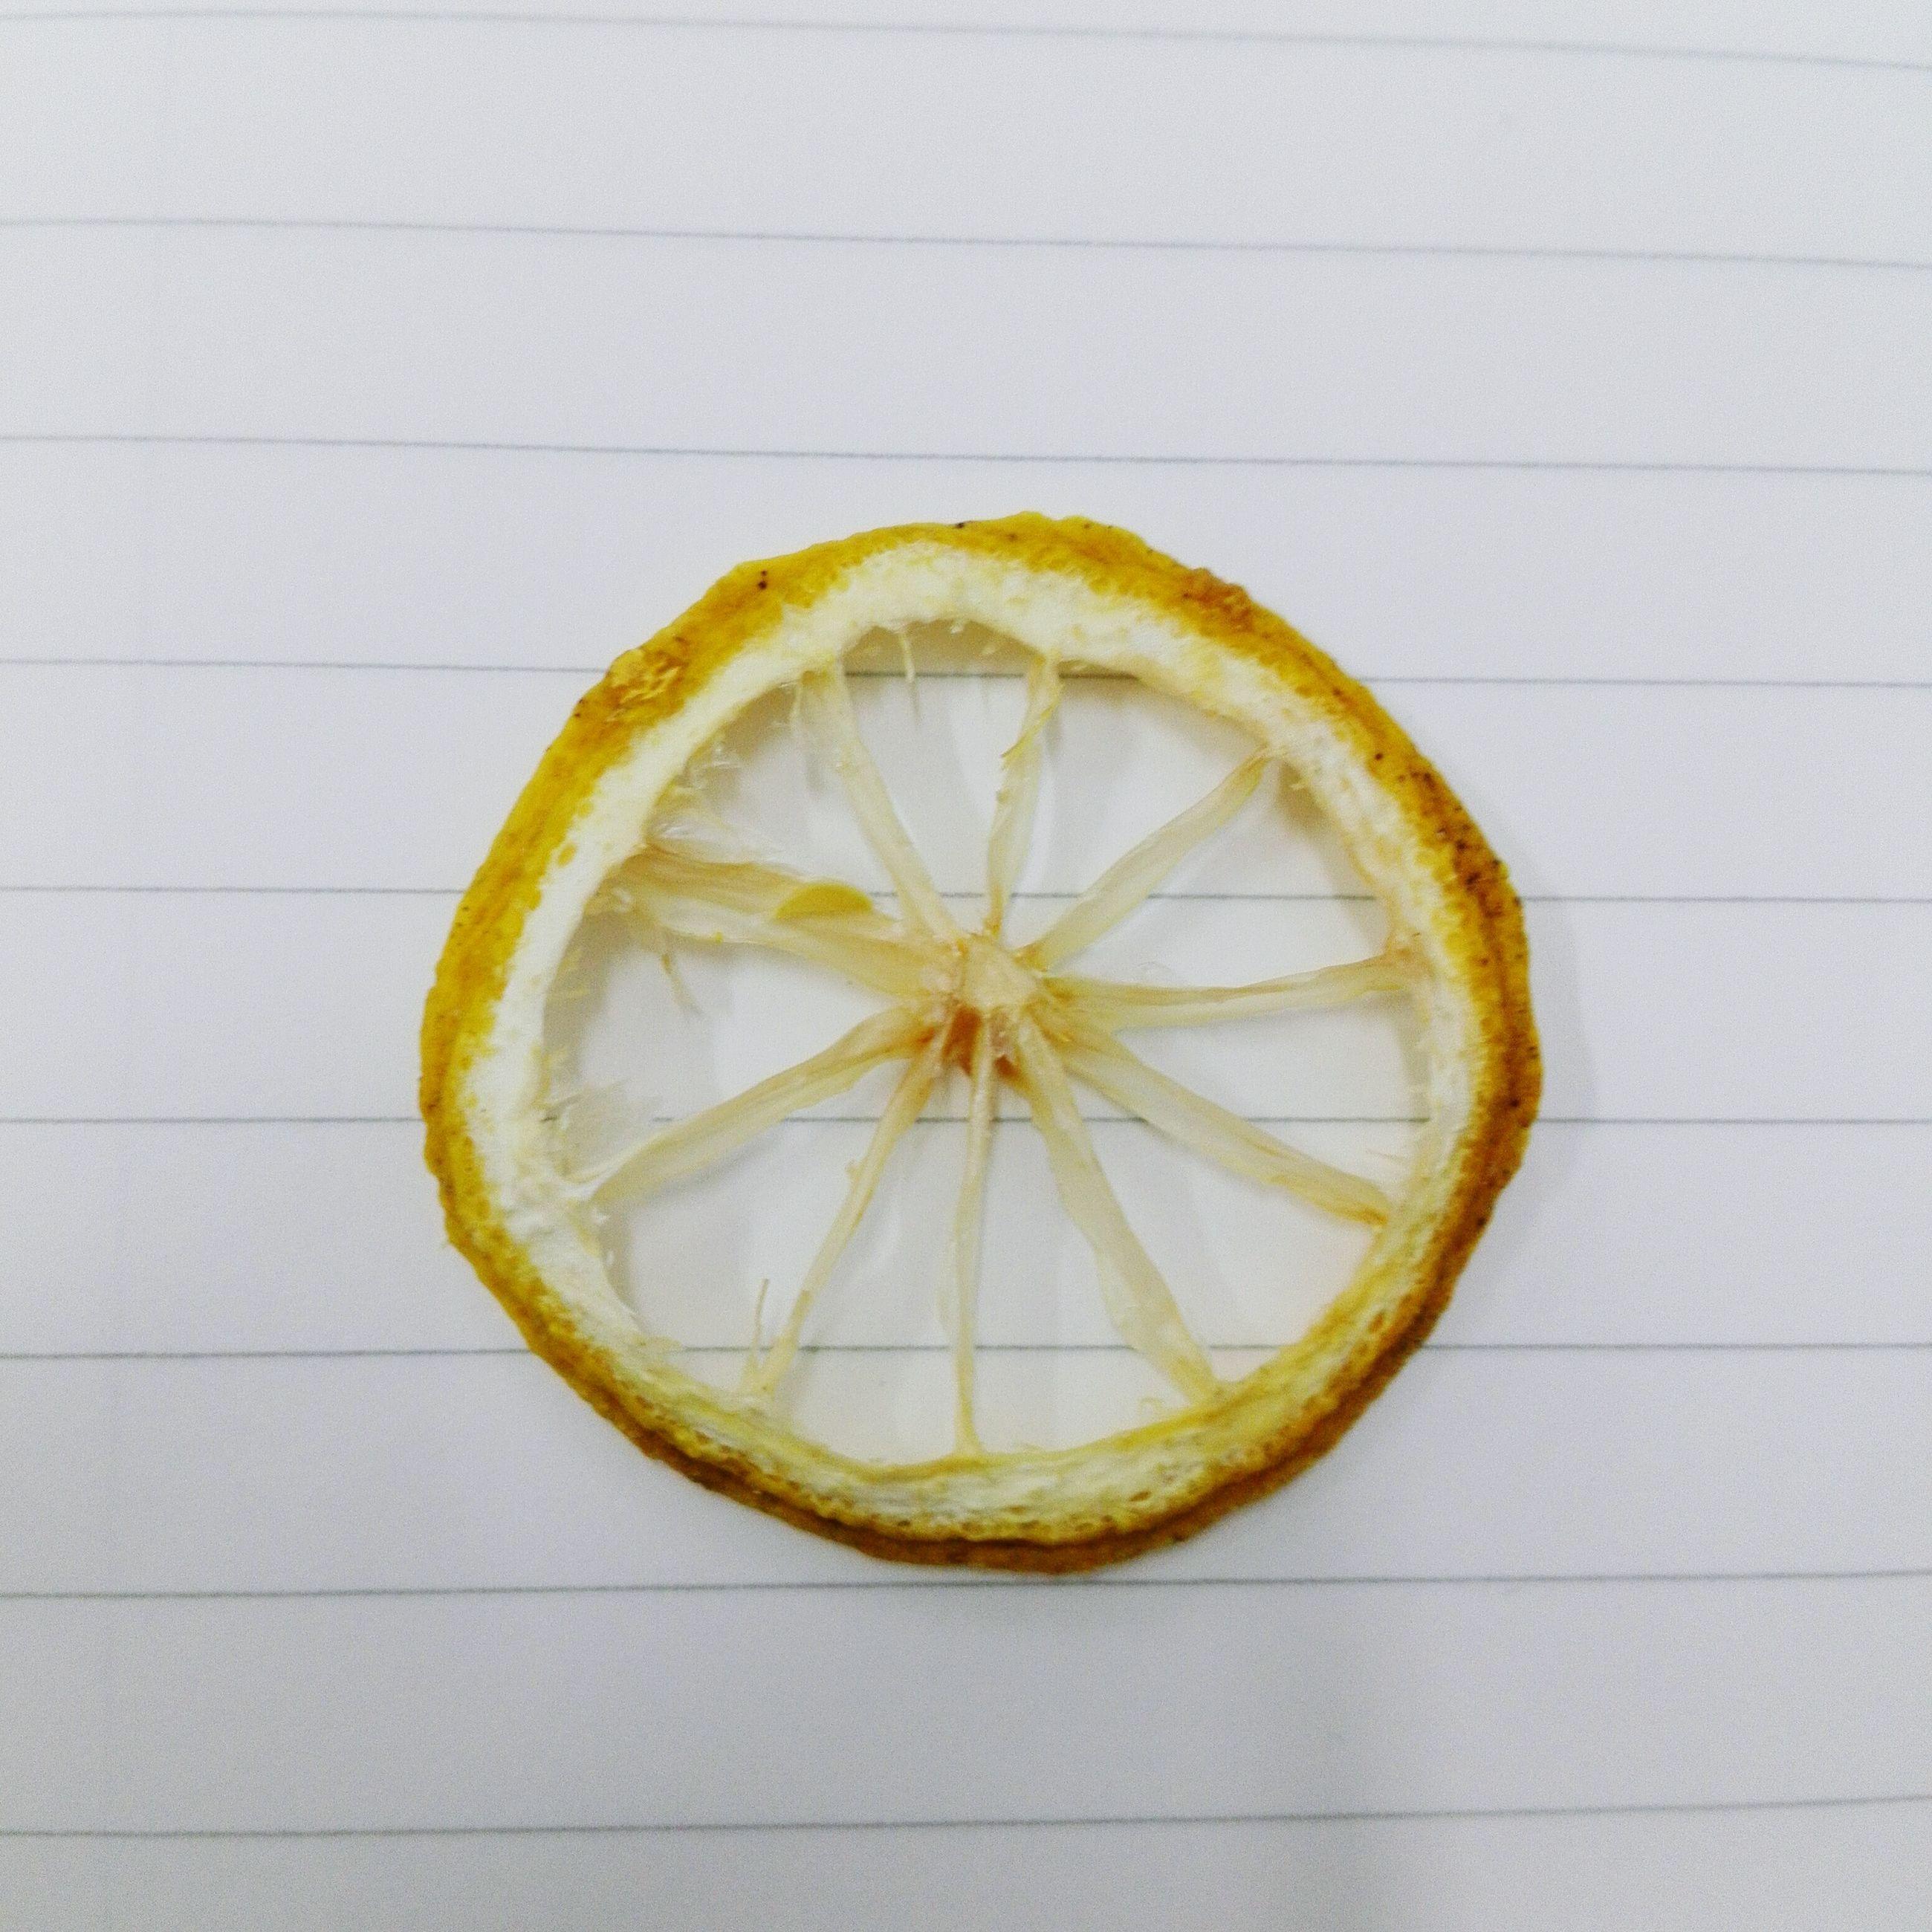 food and drink, lemon, clock, yellow, fruit, geometric shape, circle, round, messy, circular, no people